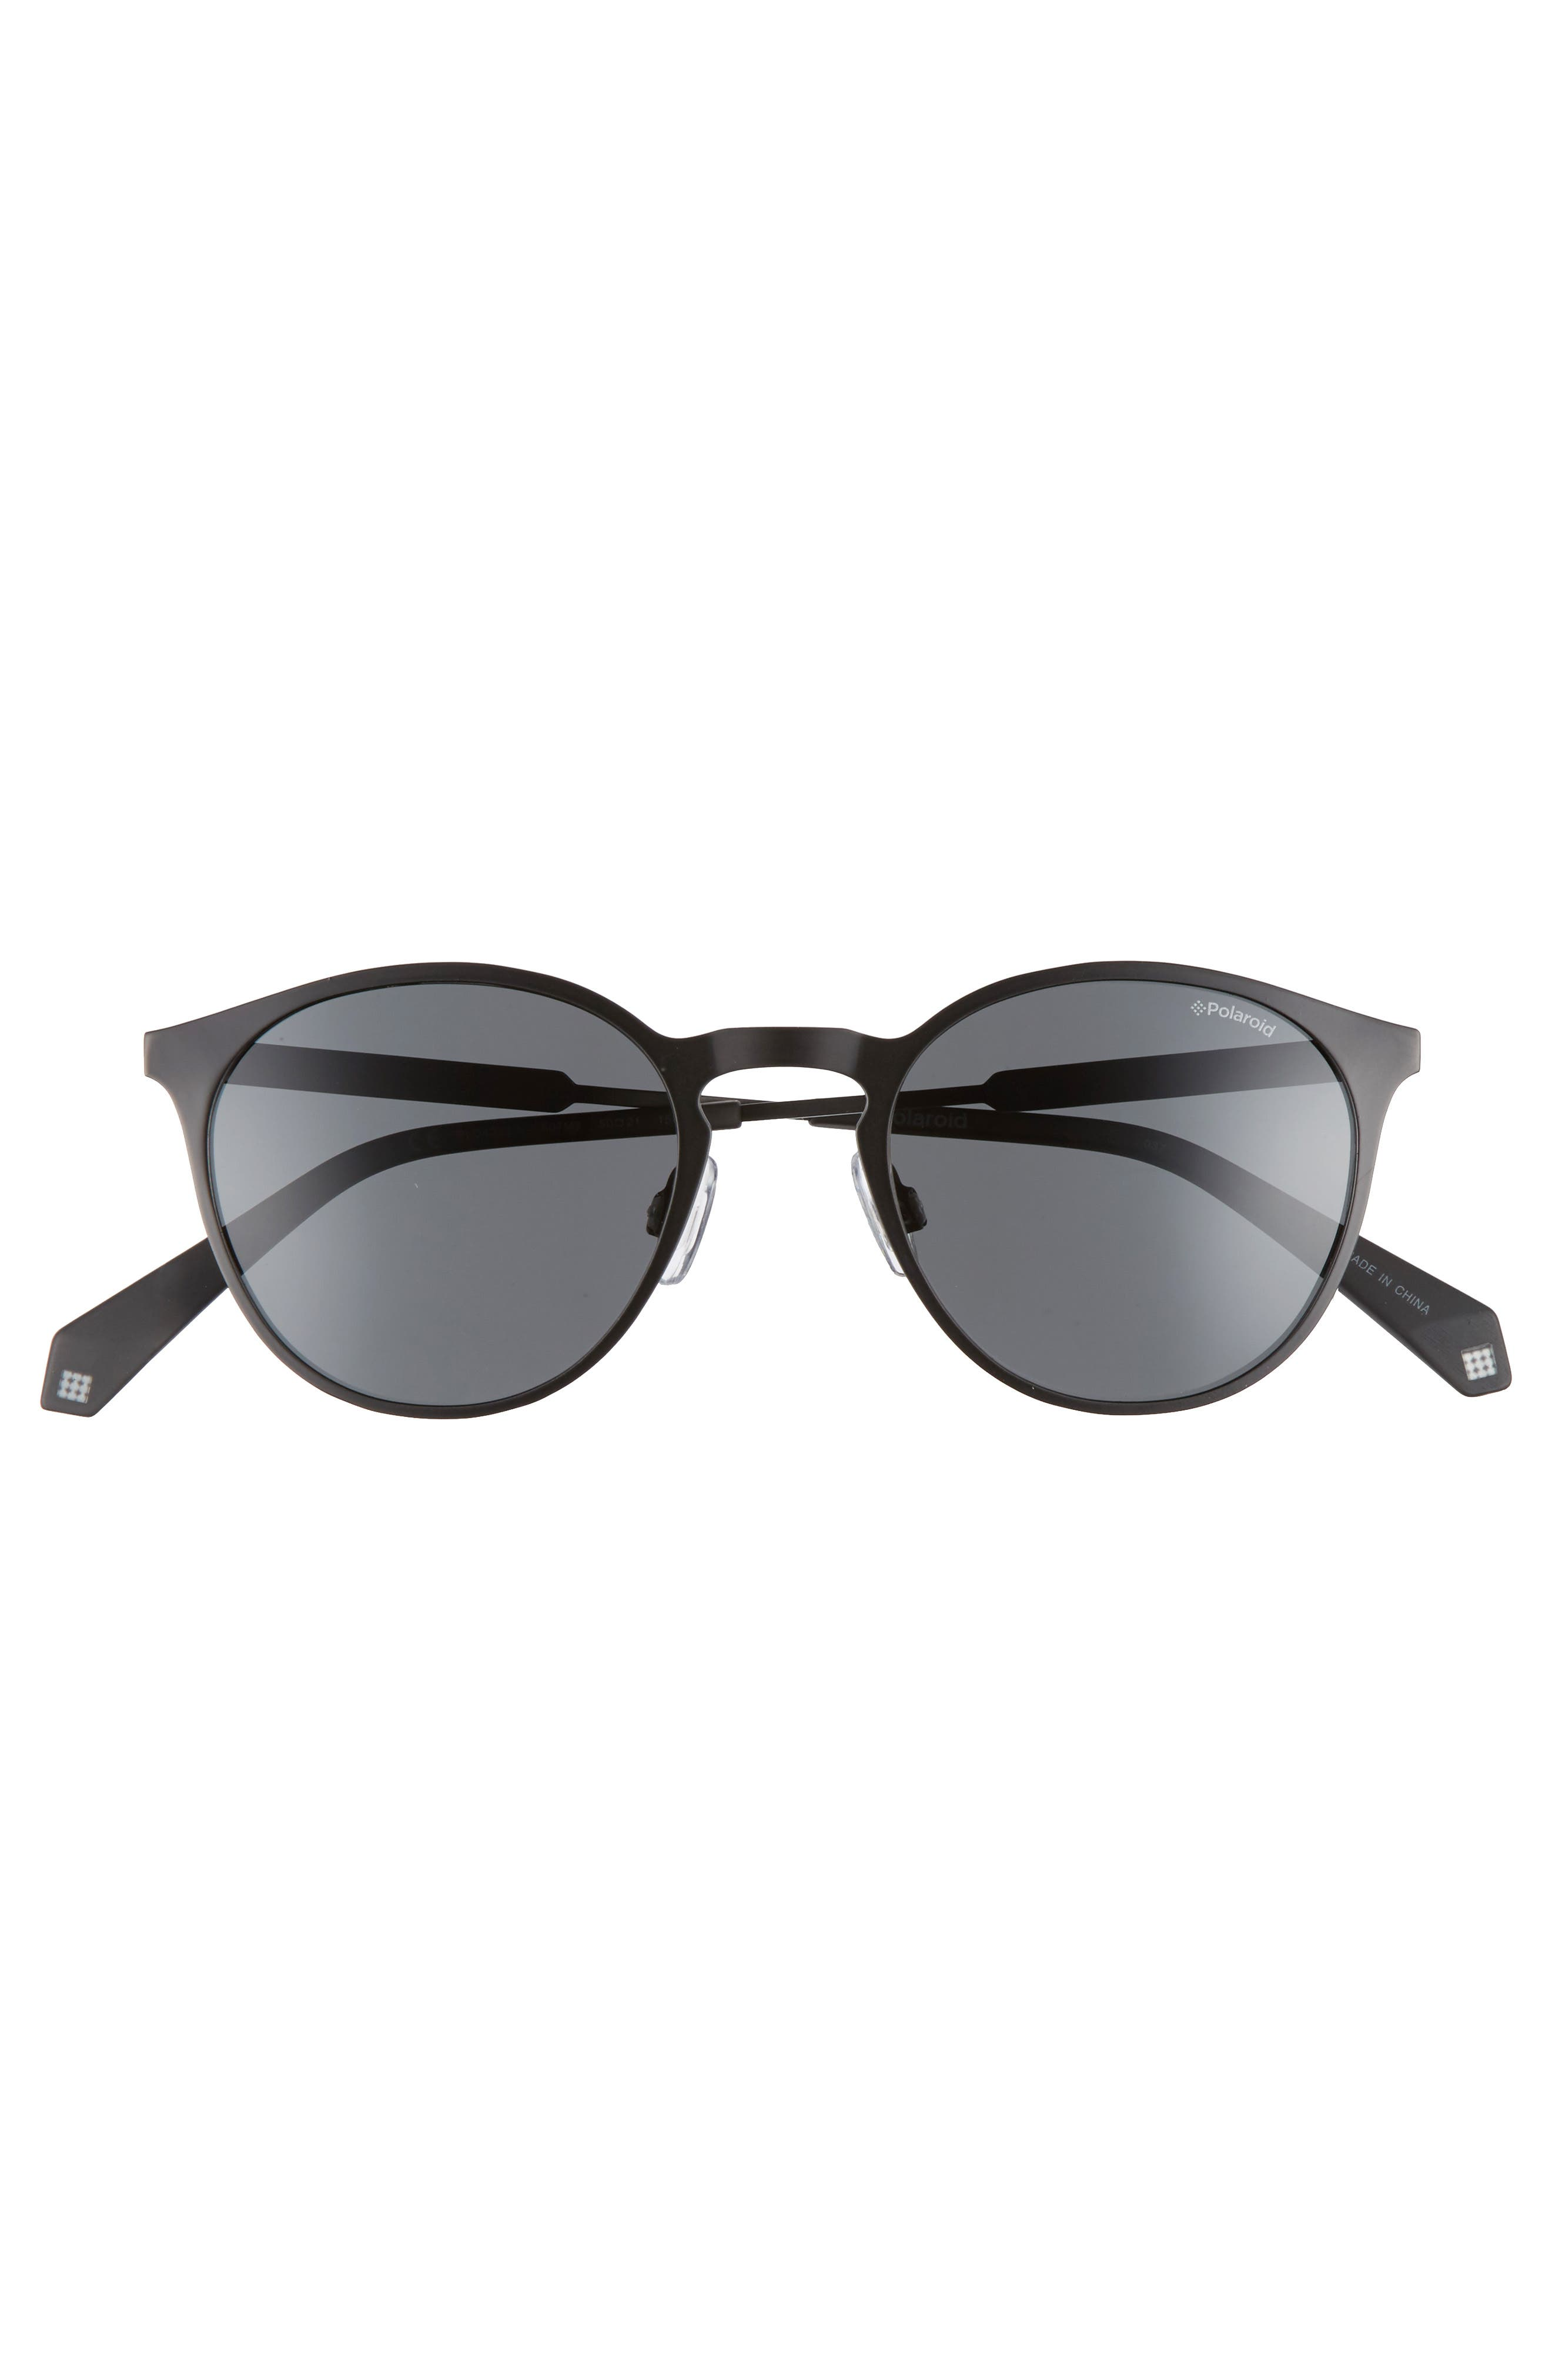 POLAROID EYEWEAR,                             Polaroid 50mm Round Polarized Sunglasses,                             Alternate thumbnail 3, color,                             002